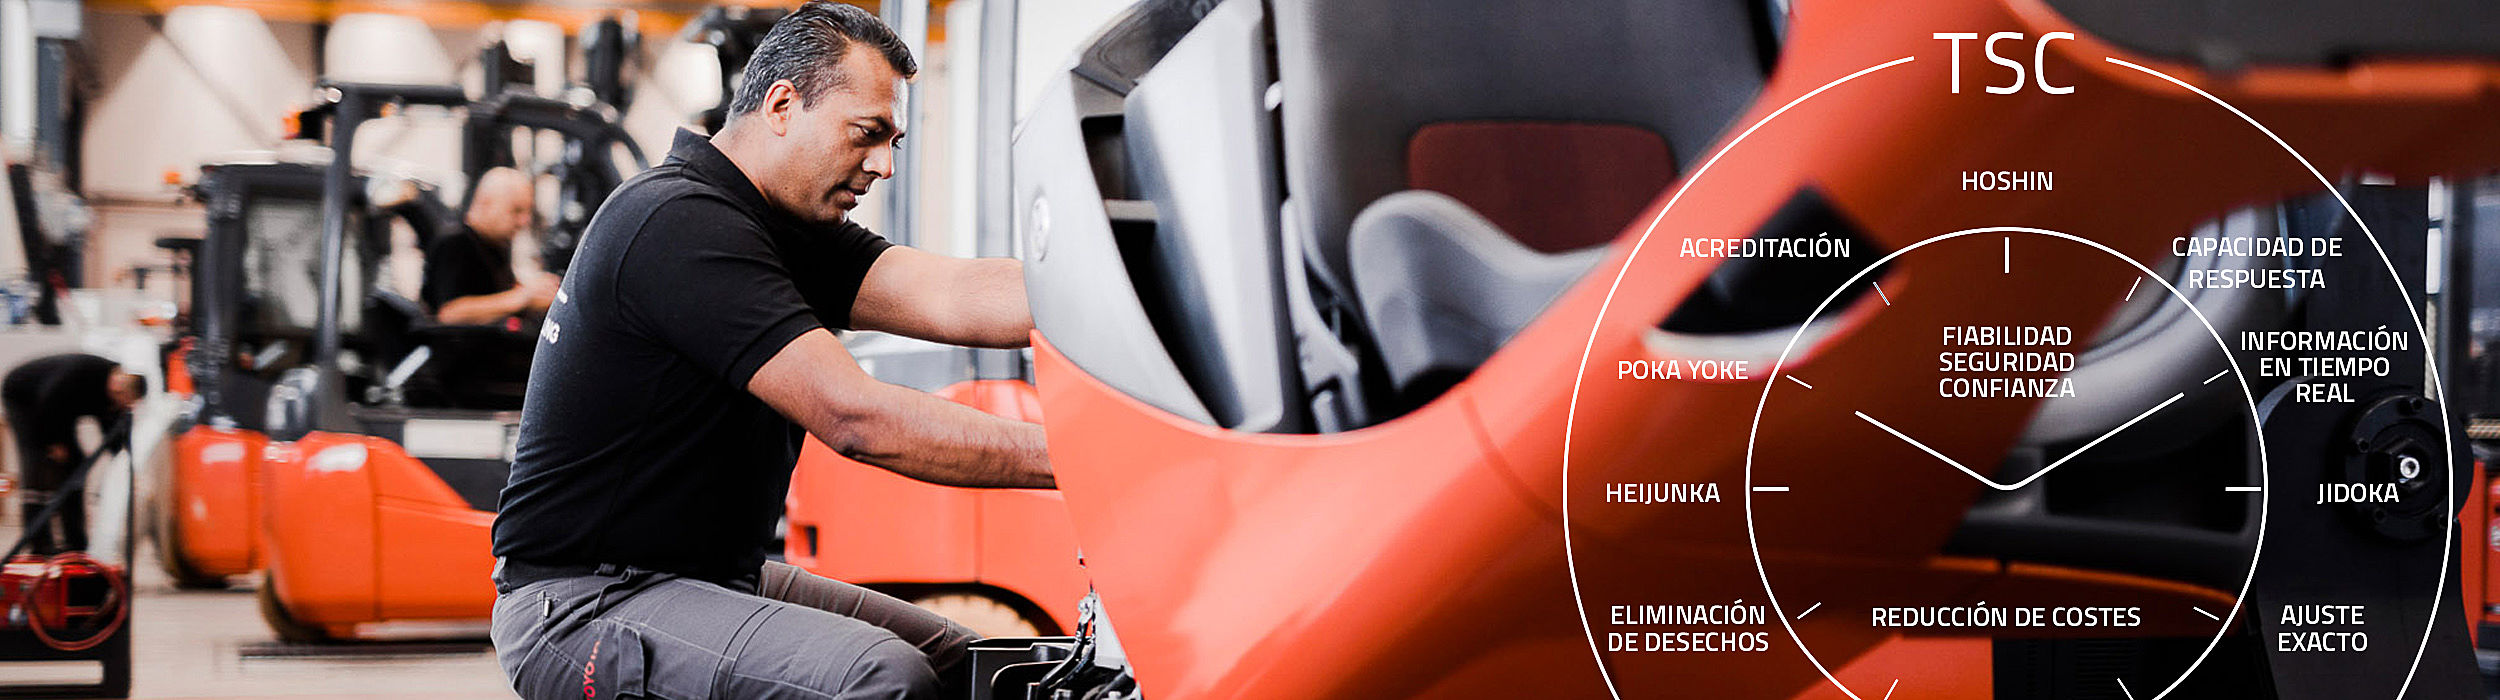 Imagen del Service Concept de Toyota